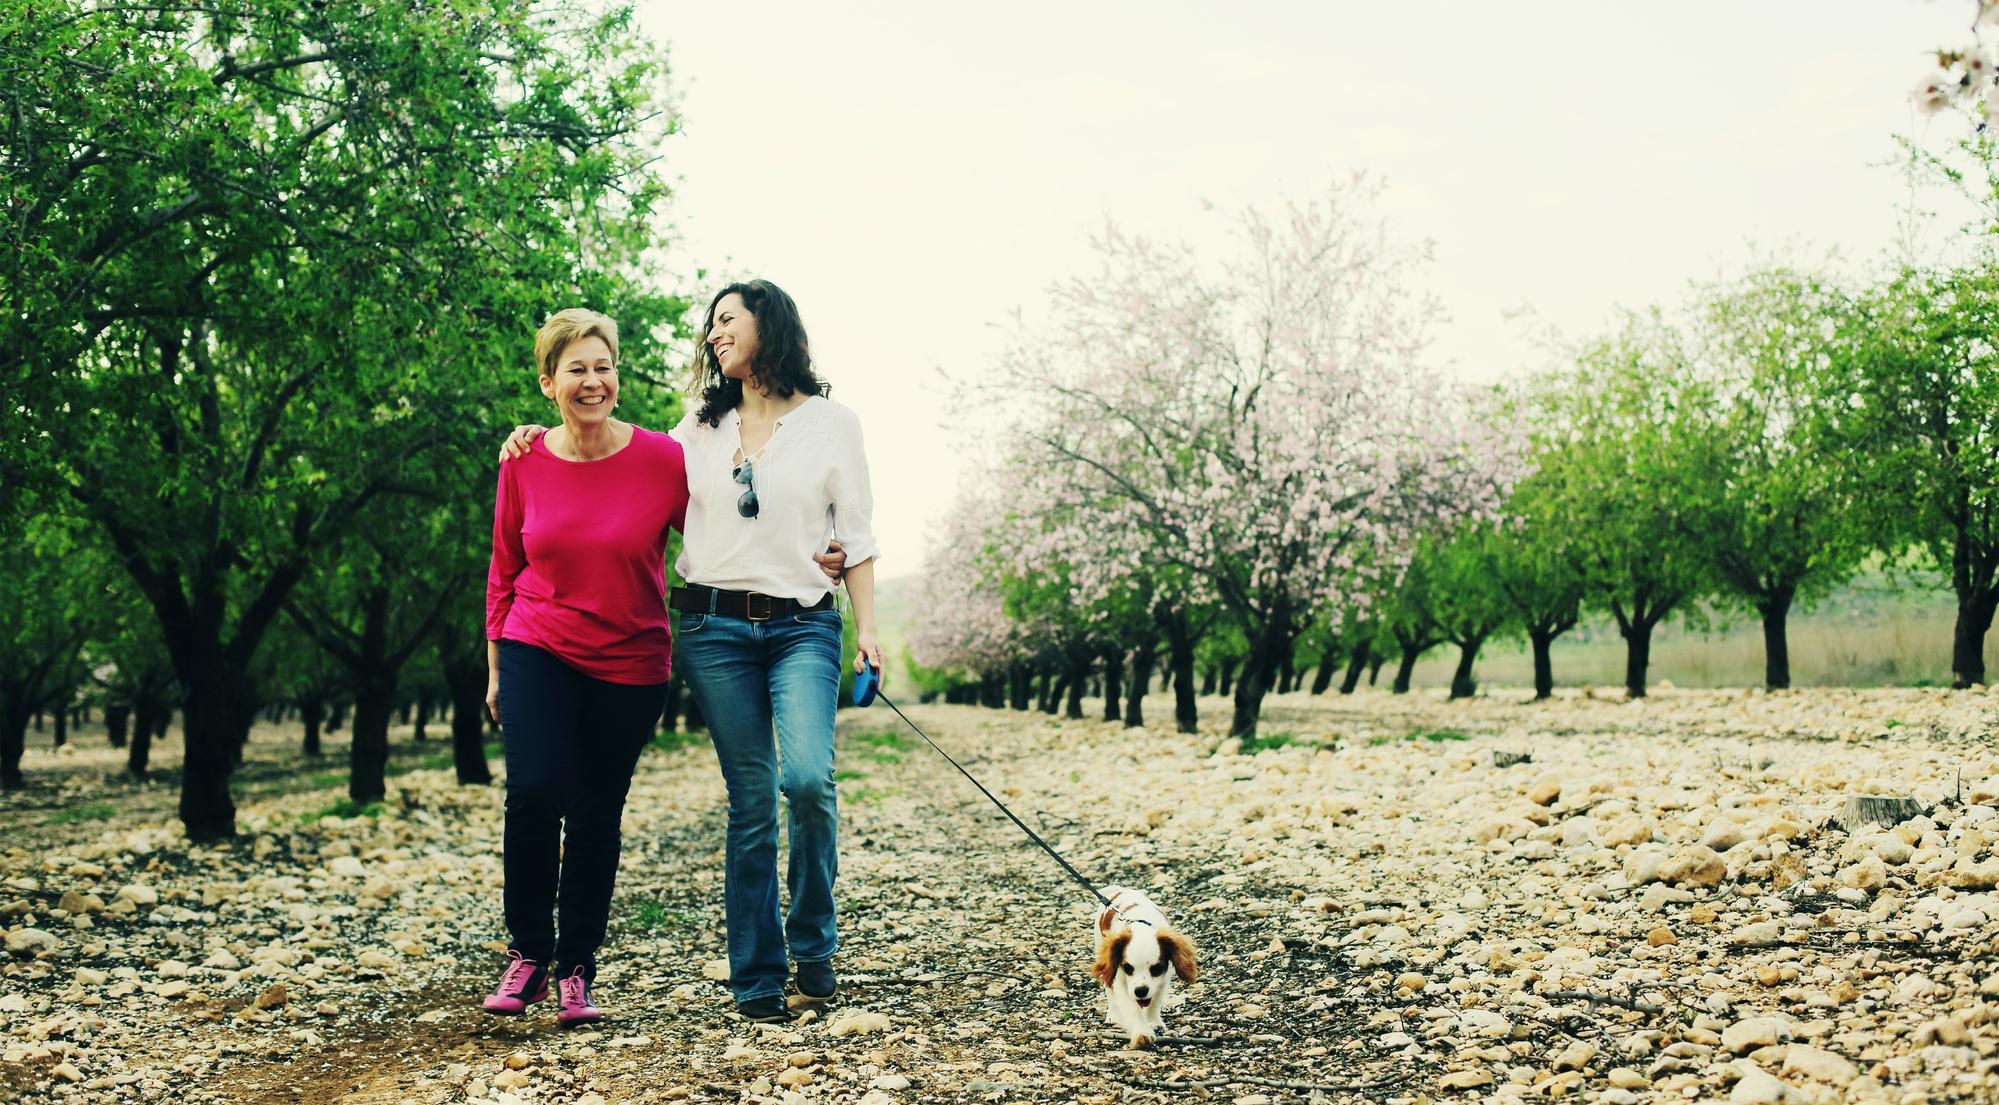 Gratitude Asknowledgment Relationship friendship mother daughter dog walking